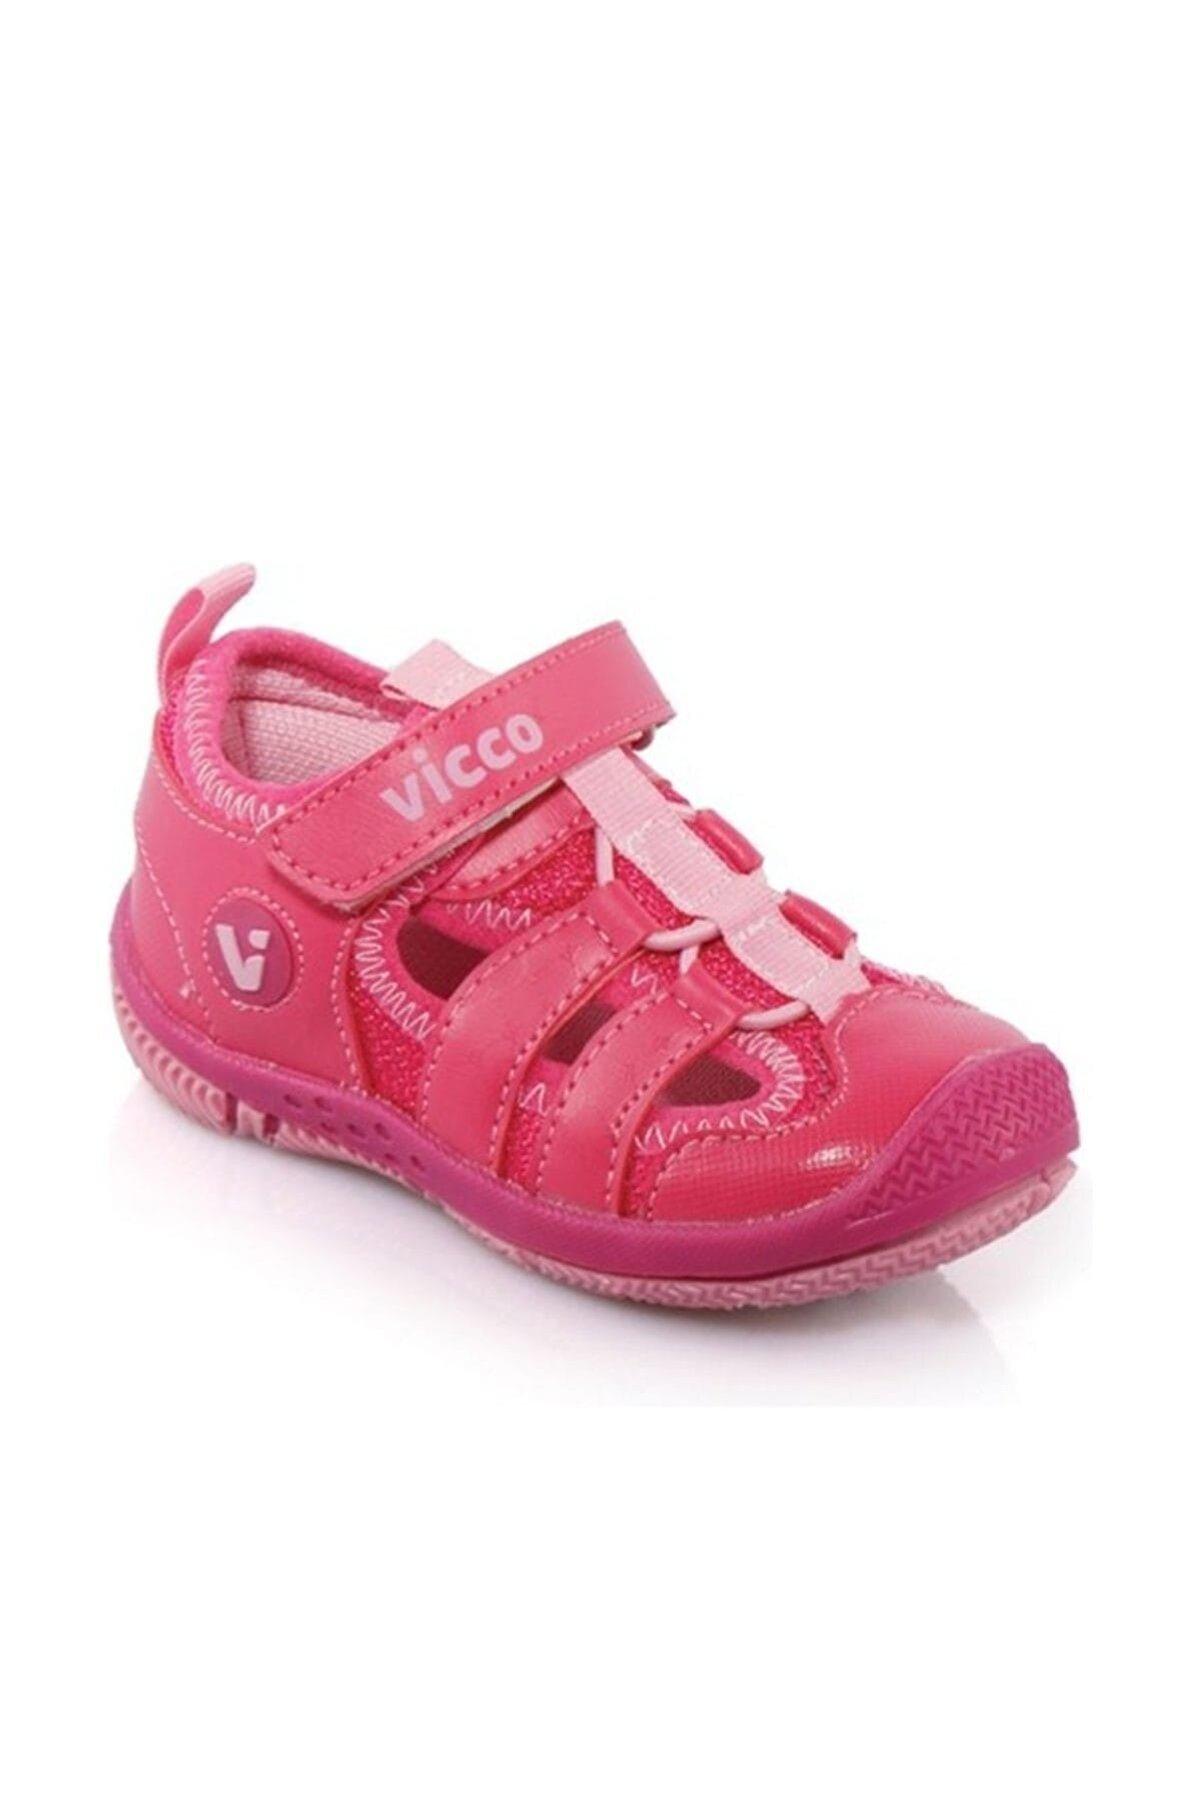 Vicco Bebek Sandalet Fuşya